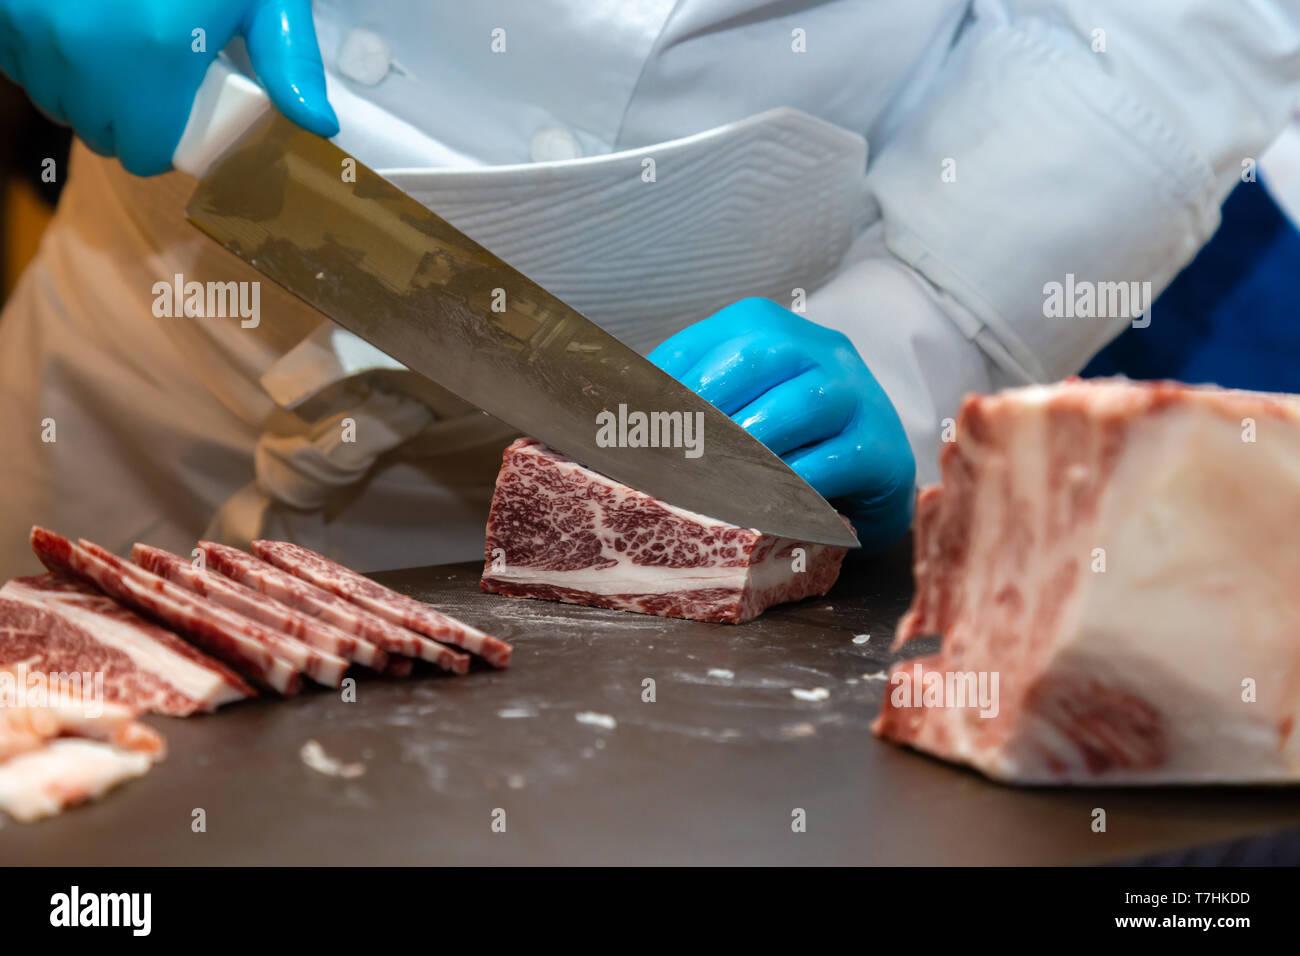 Japan Premium Beef Stock Photos & Japan Premium Beef Stock